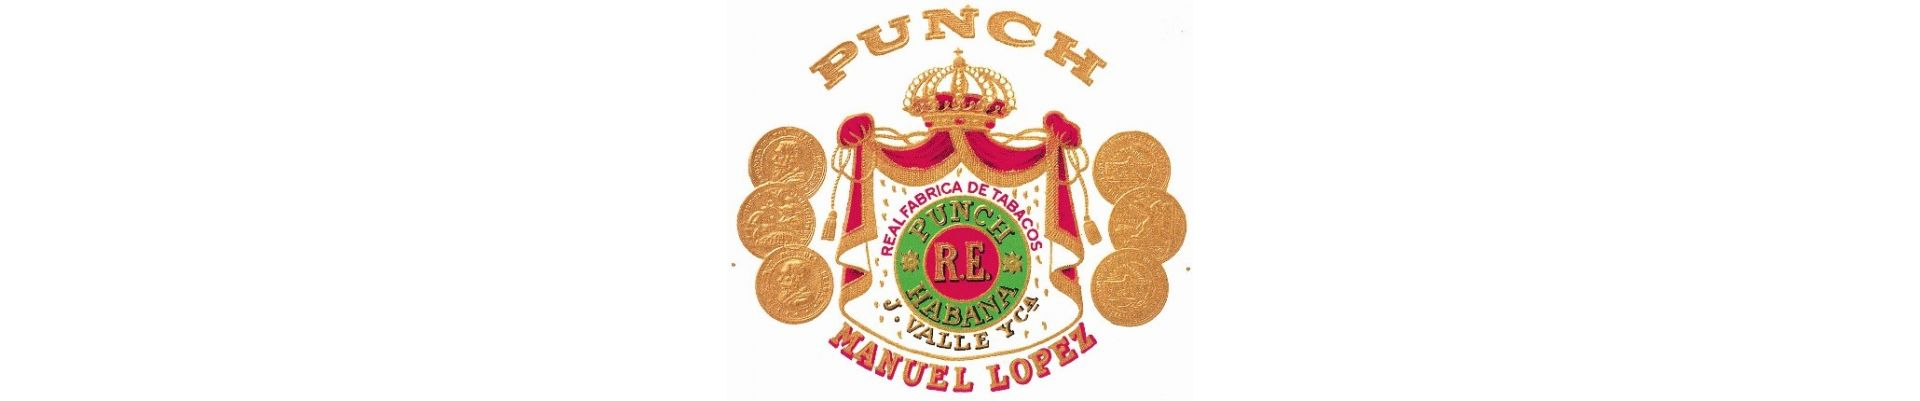 Trabucuri Punch trabucuri cubaneze Punch trabuc cubanez.Magazin trabuc